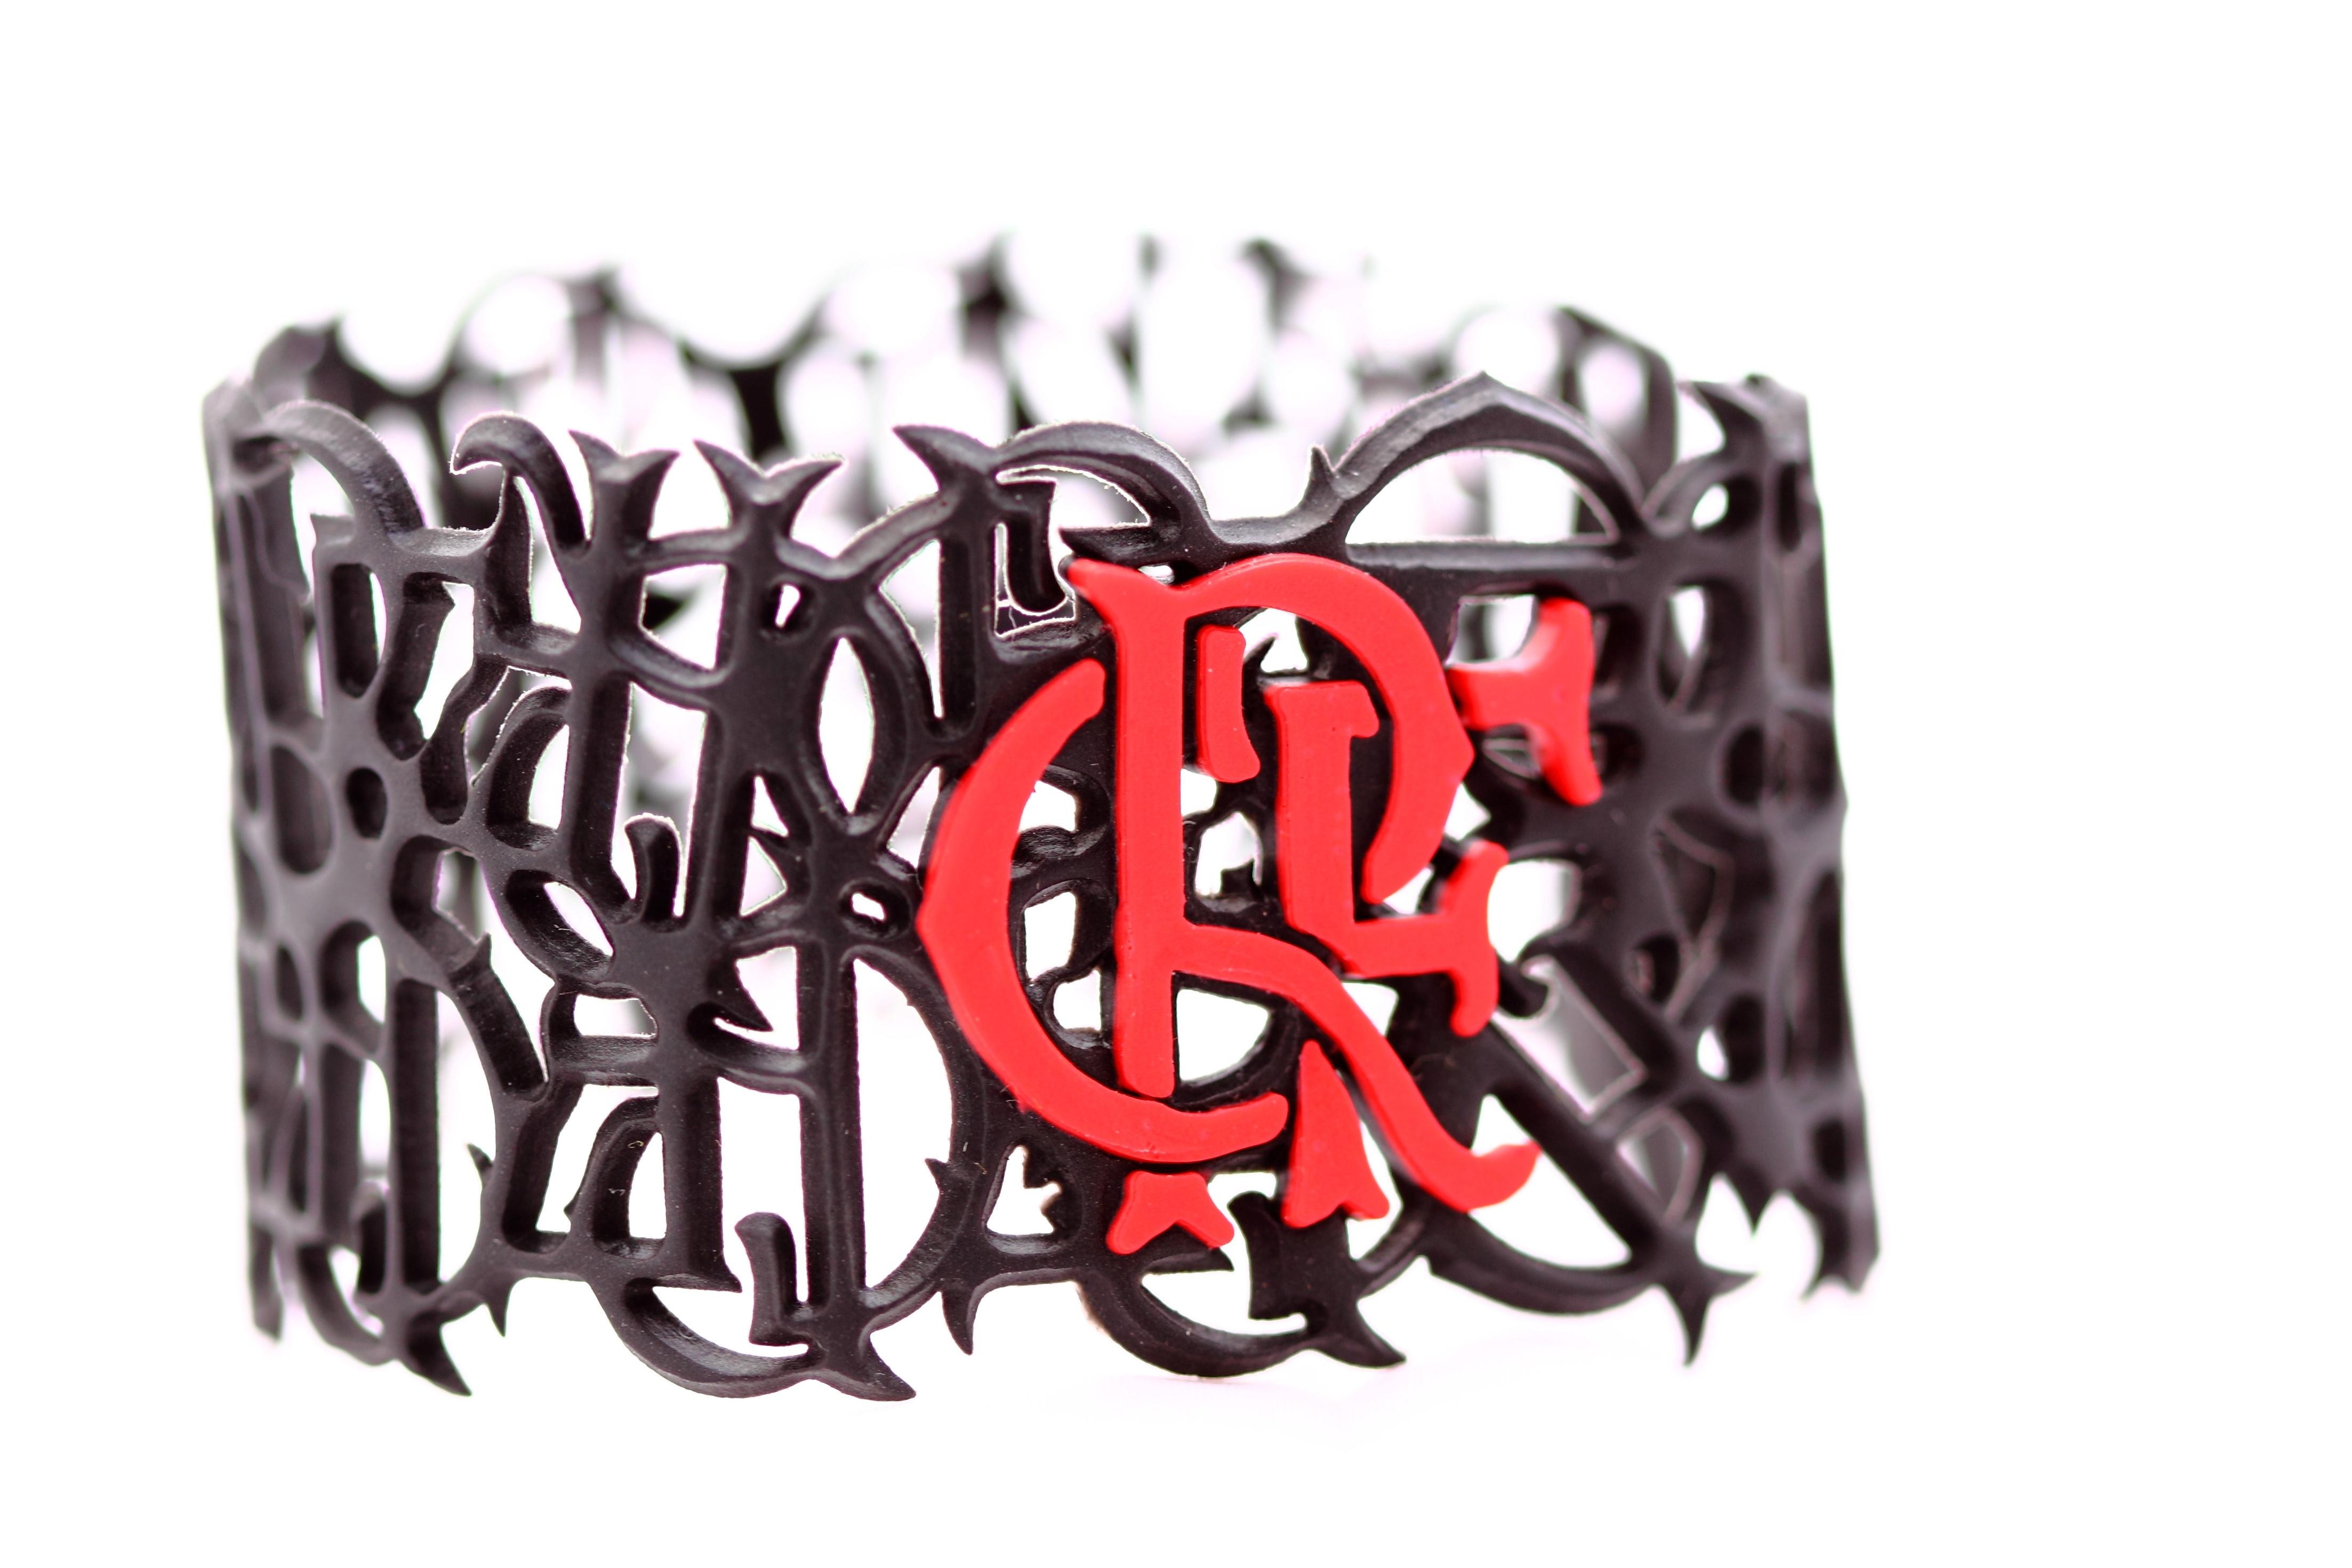 http://sport2wear.files.wordpress.com/2009/12/sport-collection-marzio-fiorini-pulseira-crf.jpg